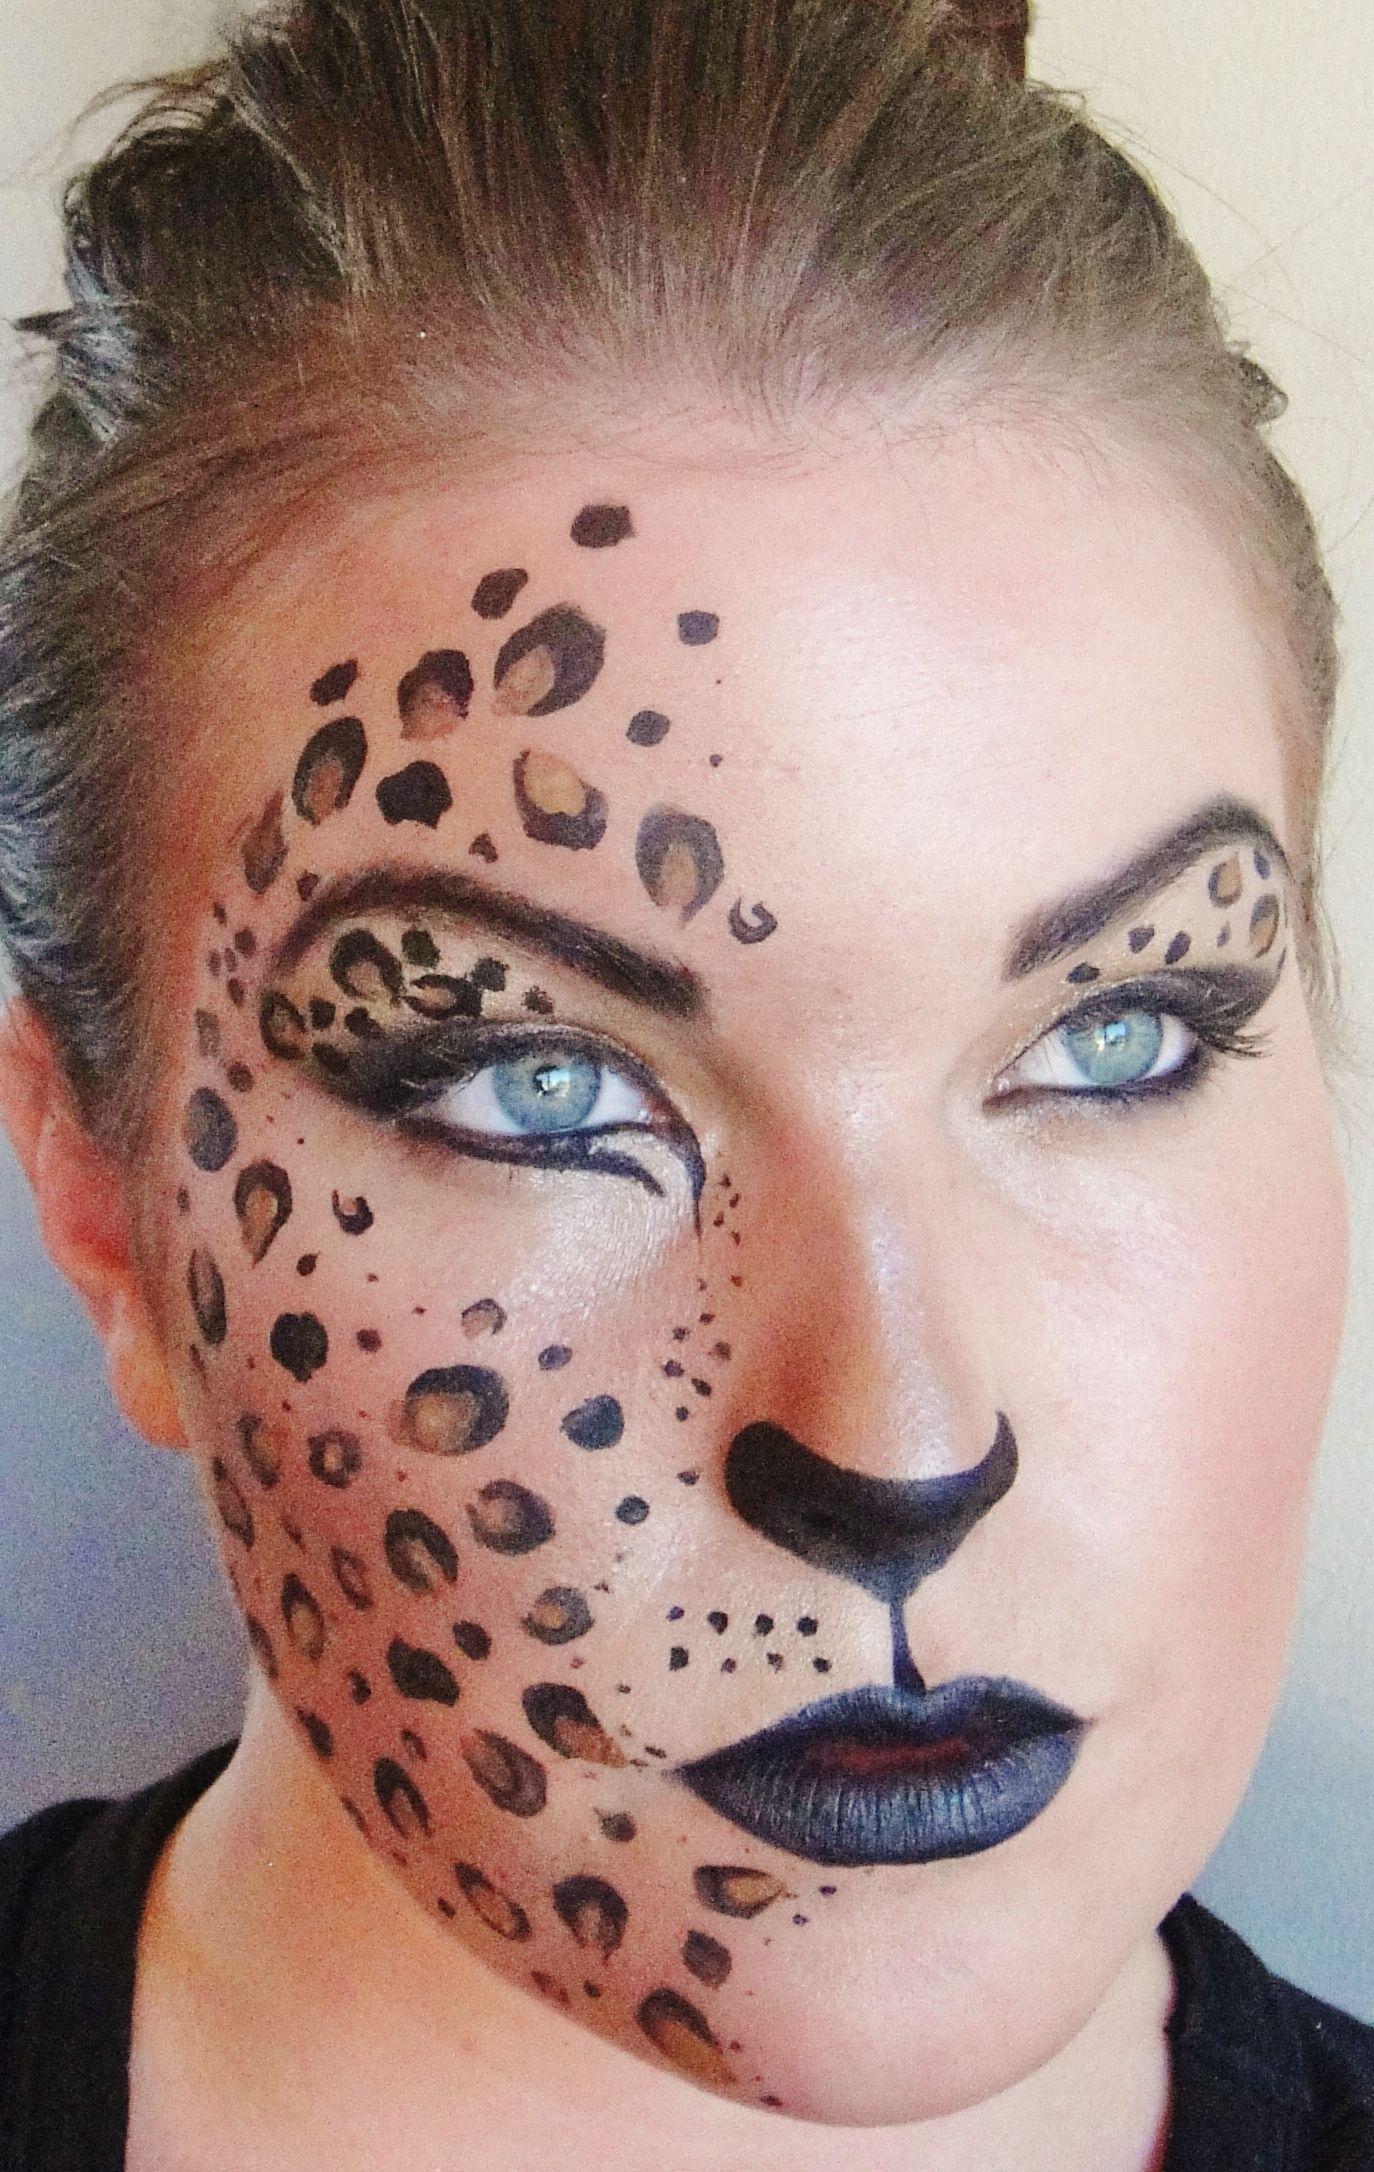 Leopard half mask Halloween cool creepy mysterious pretty